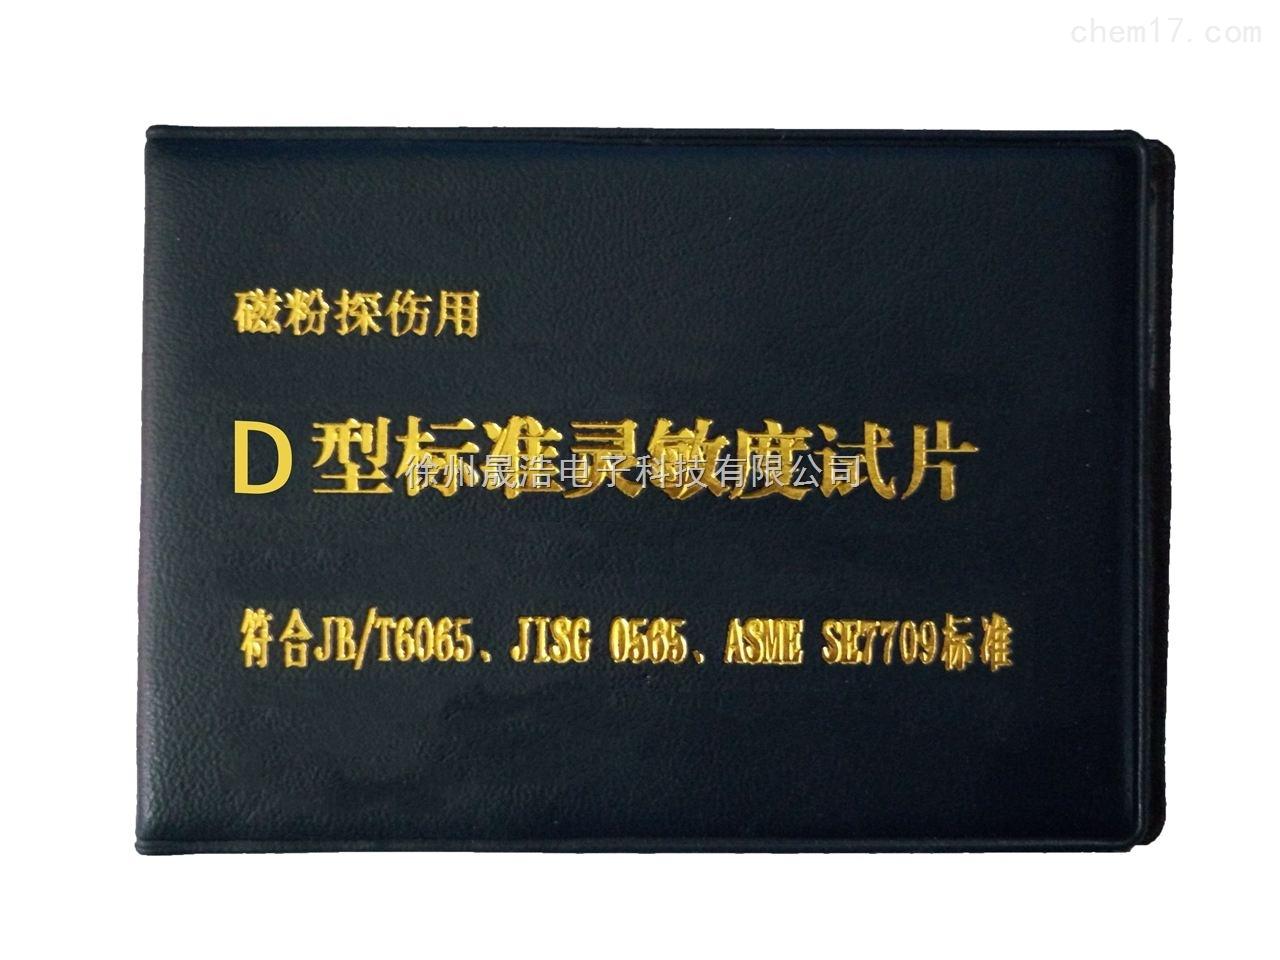 D1-磁粉探伤标准灵敏度试片